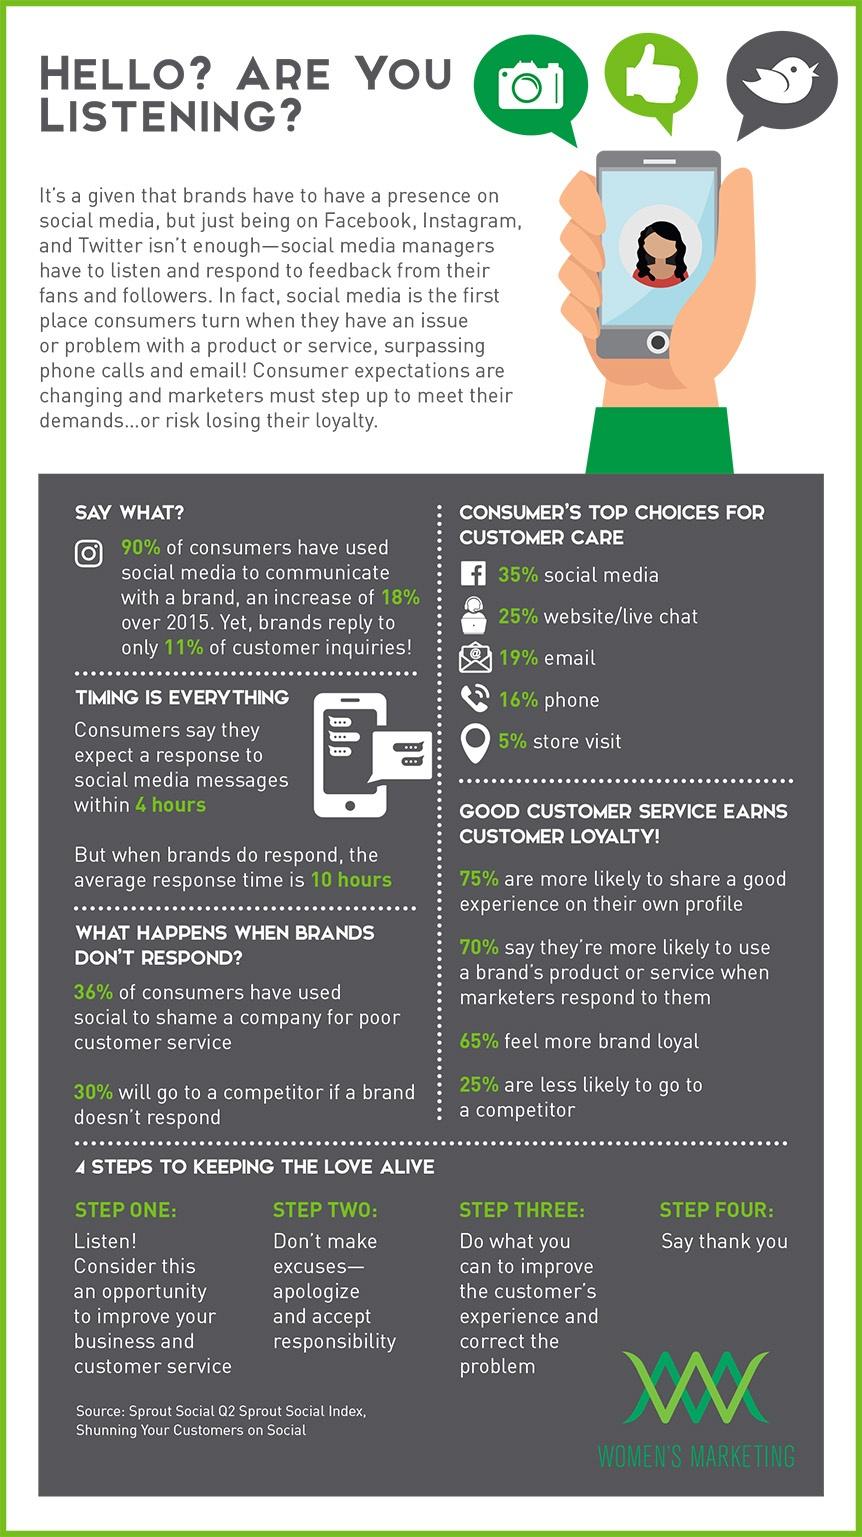 HelloAreYouListening_Infographic.jpg